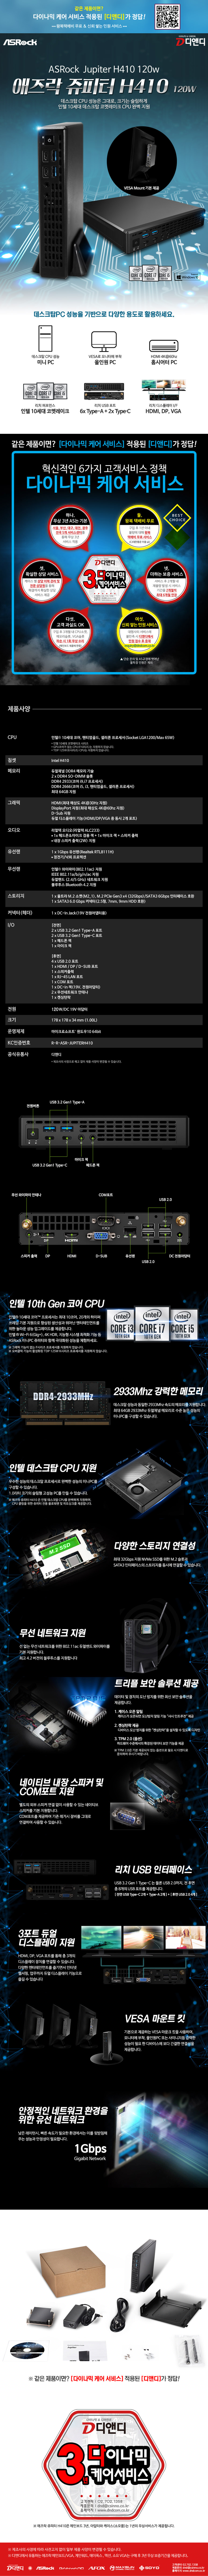 ASRock Jupiter H410 i3-10100 120W 디앤디컴 (16GB, M2 512GB)